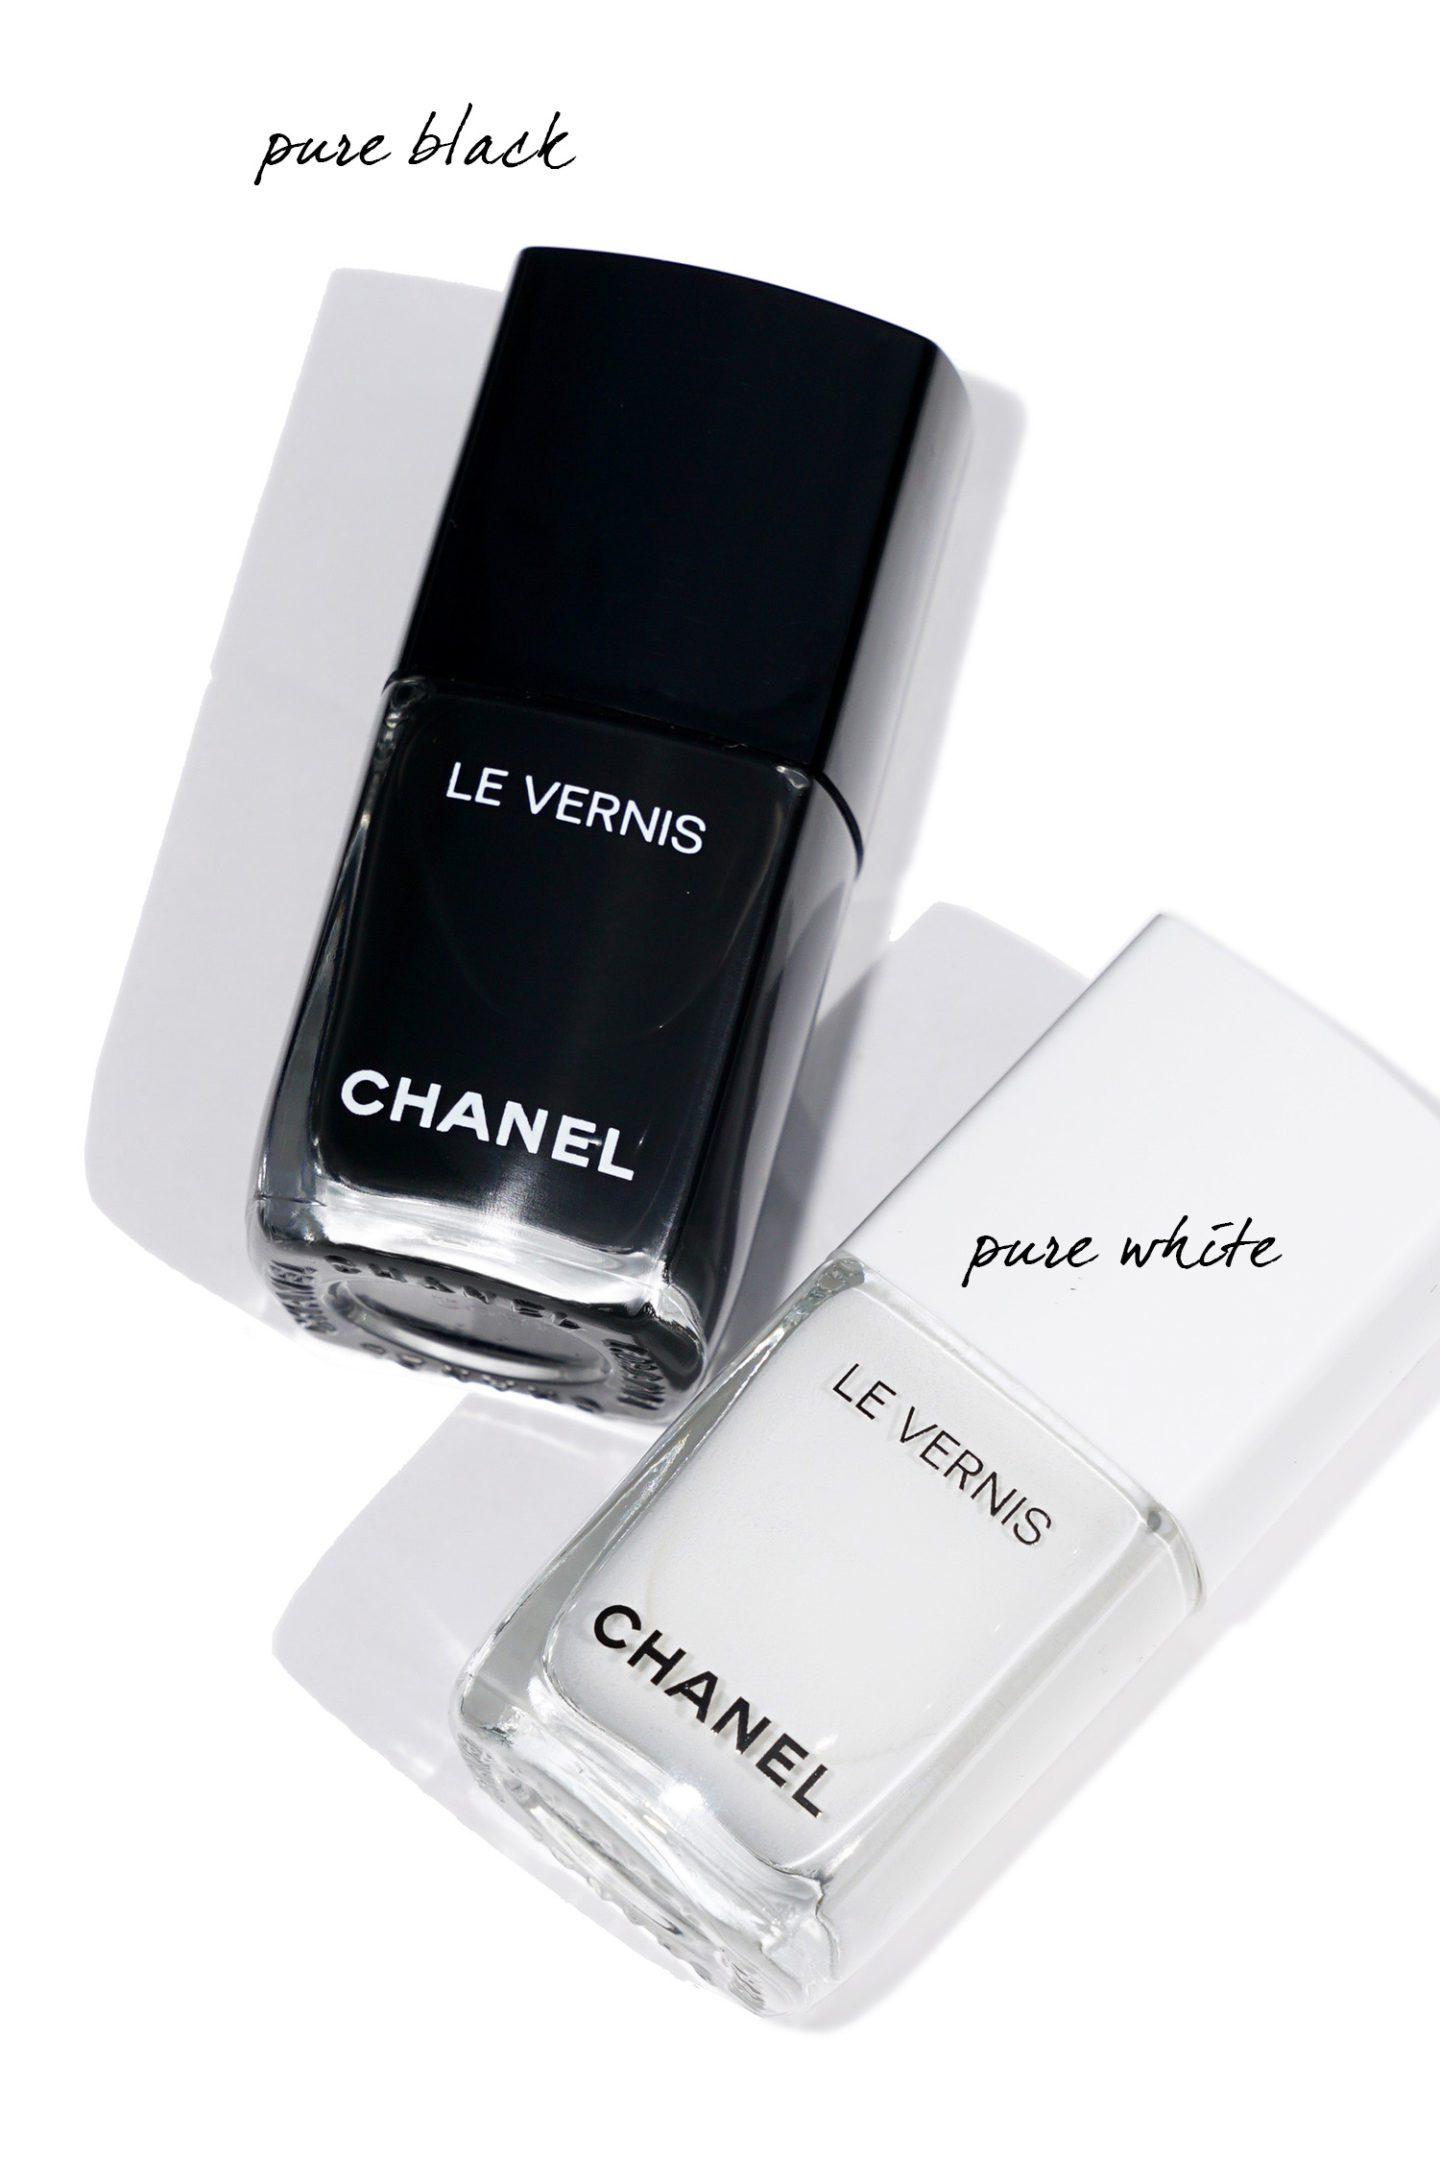 Chanel Fall 2019 Le Vernis Pure Black and Pure White